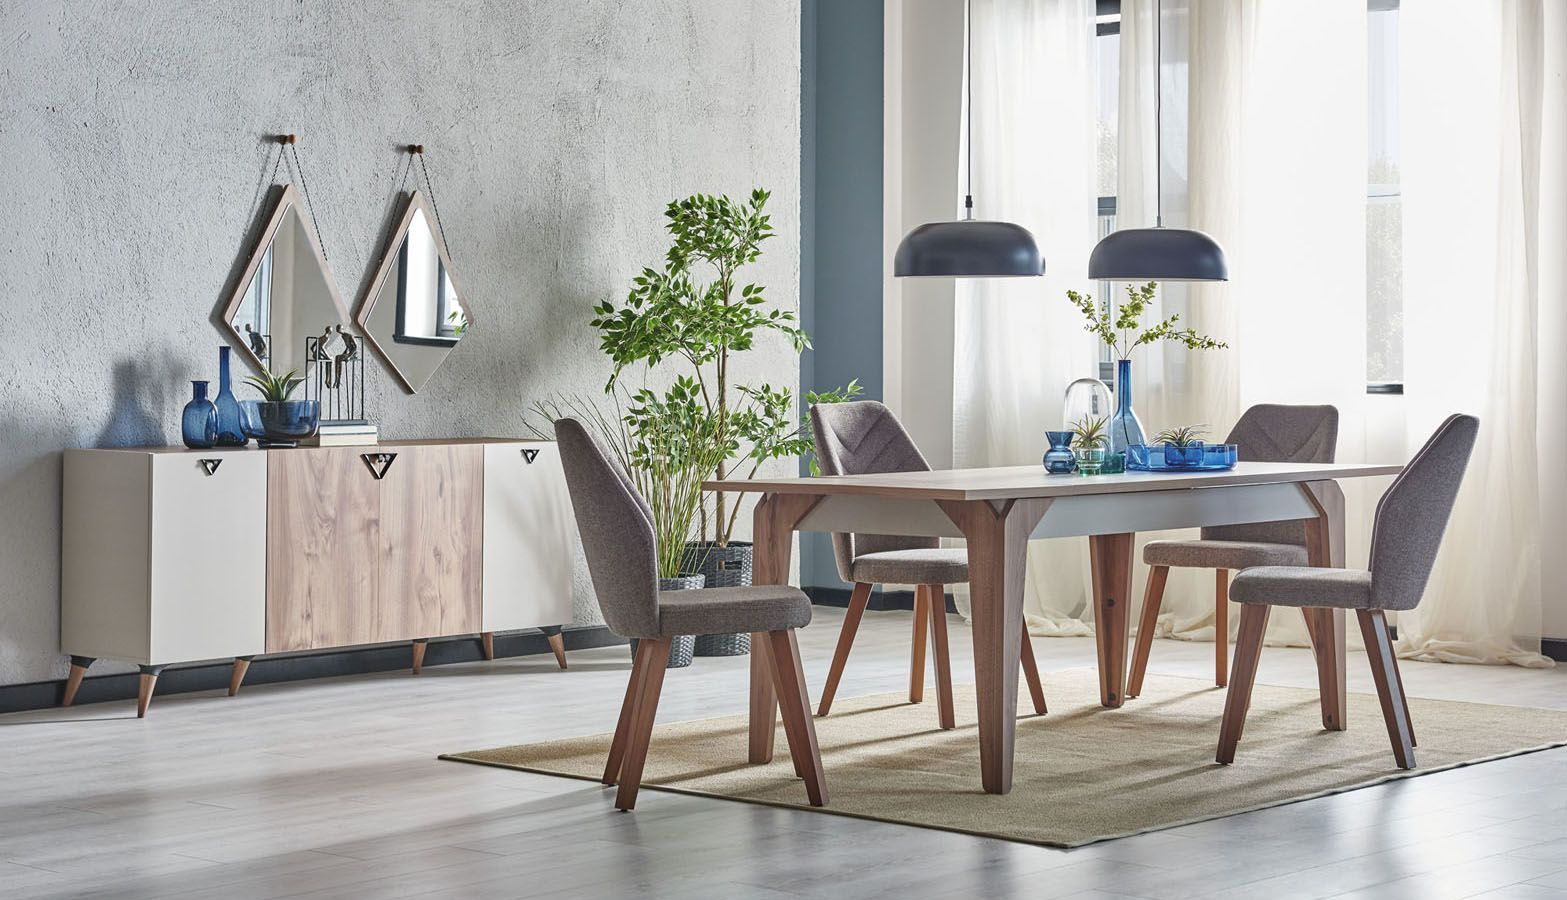 سفرة مودرن Polygon In 2020 Modern Dining Room Home Decor Modern Dining